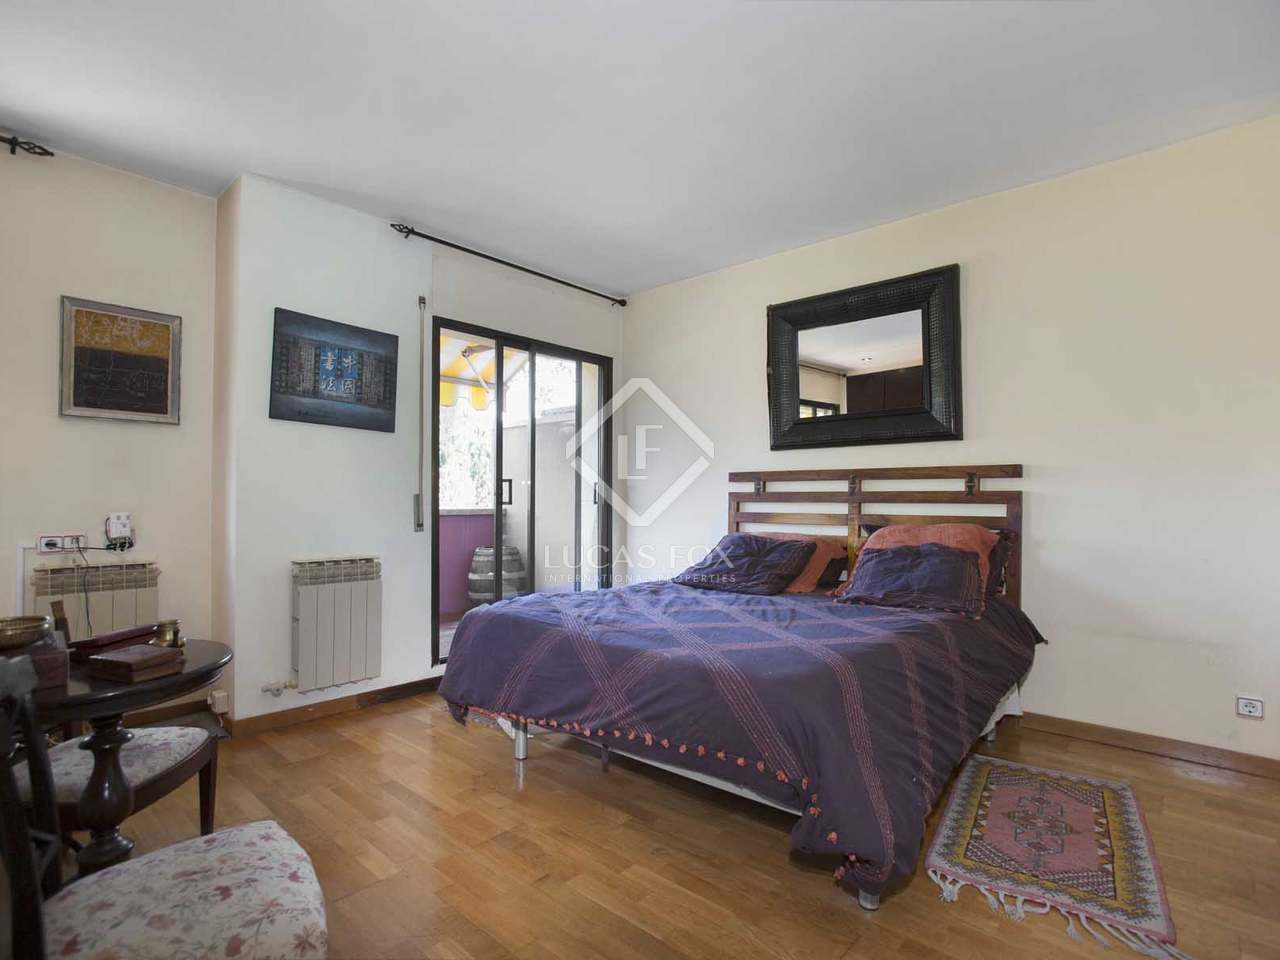 4 Bedroom Townhouse For Sale In Alella Maresme Coast